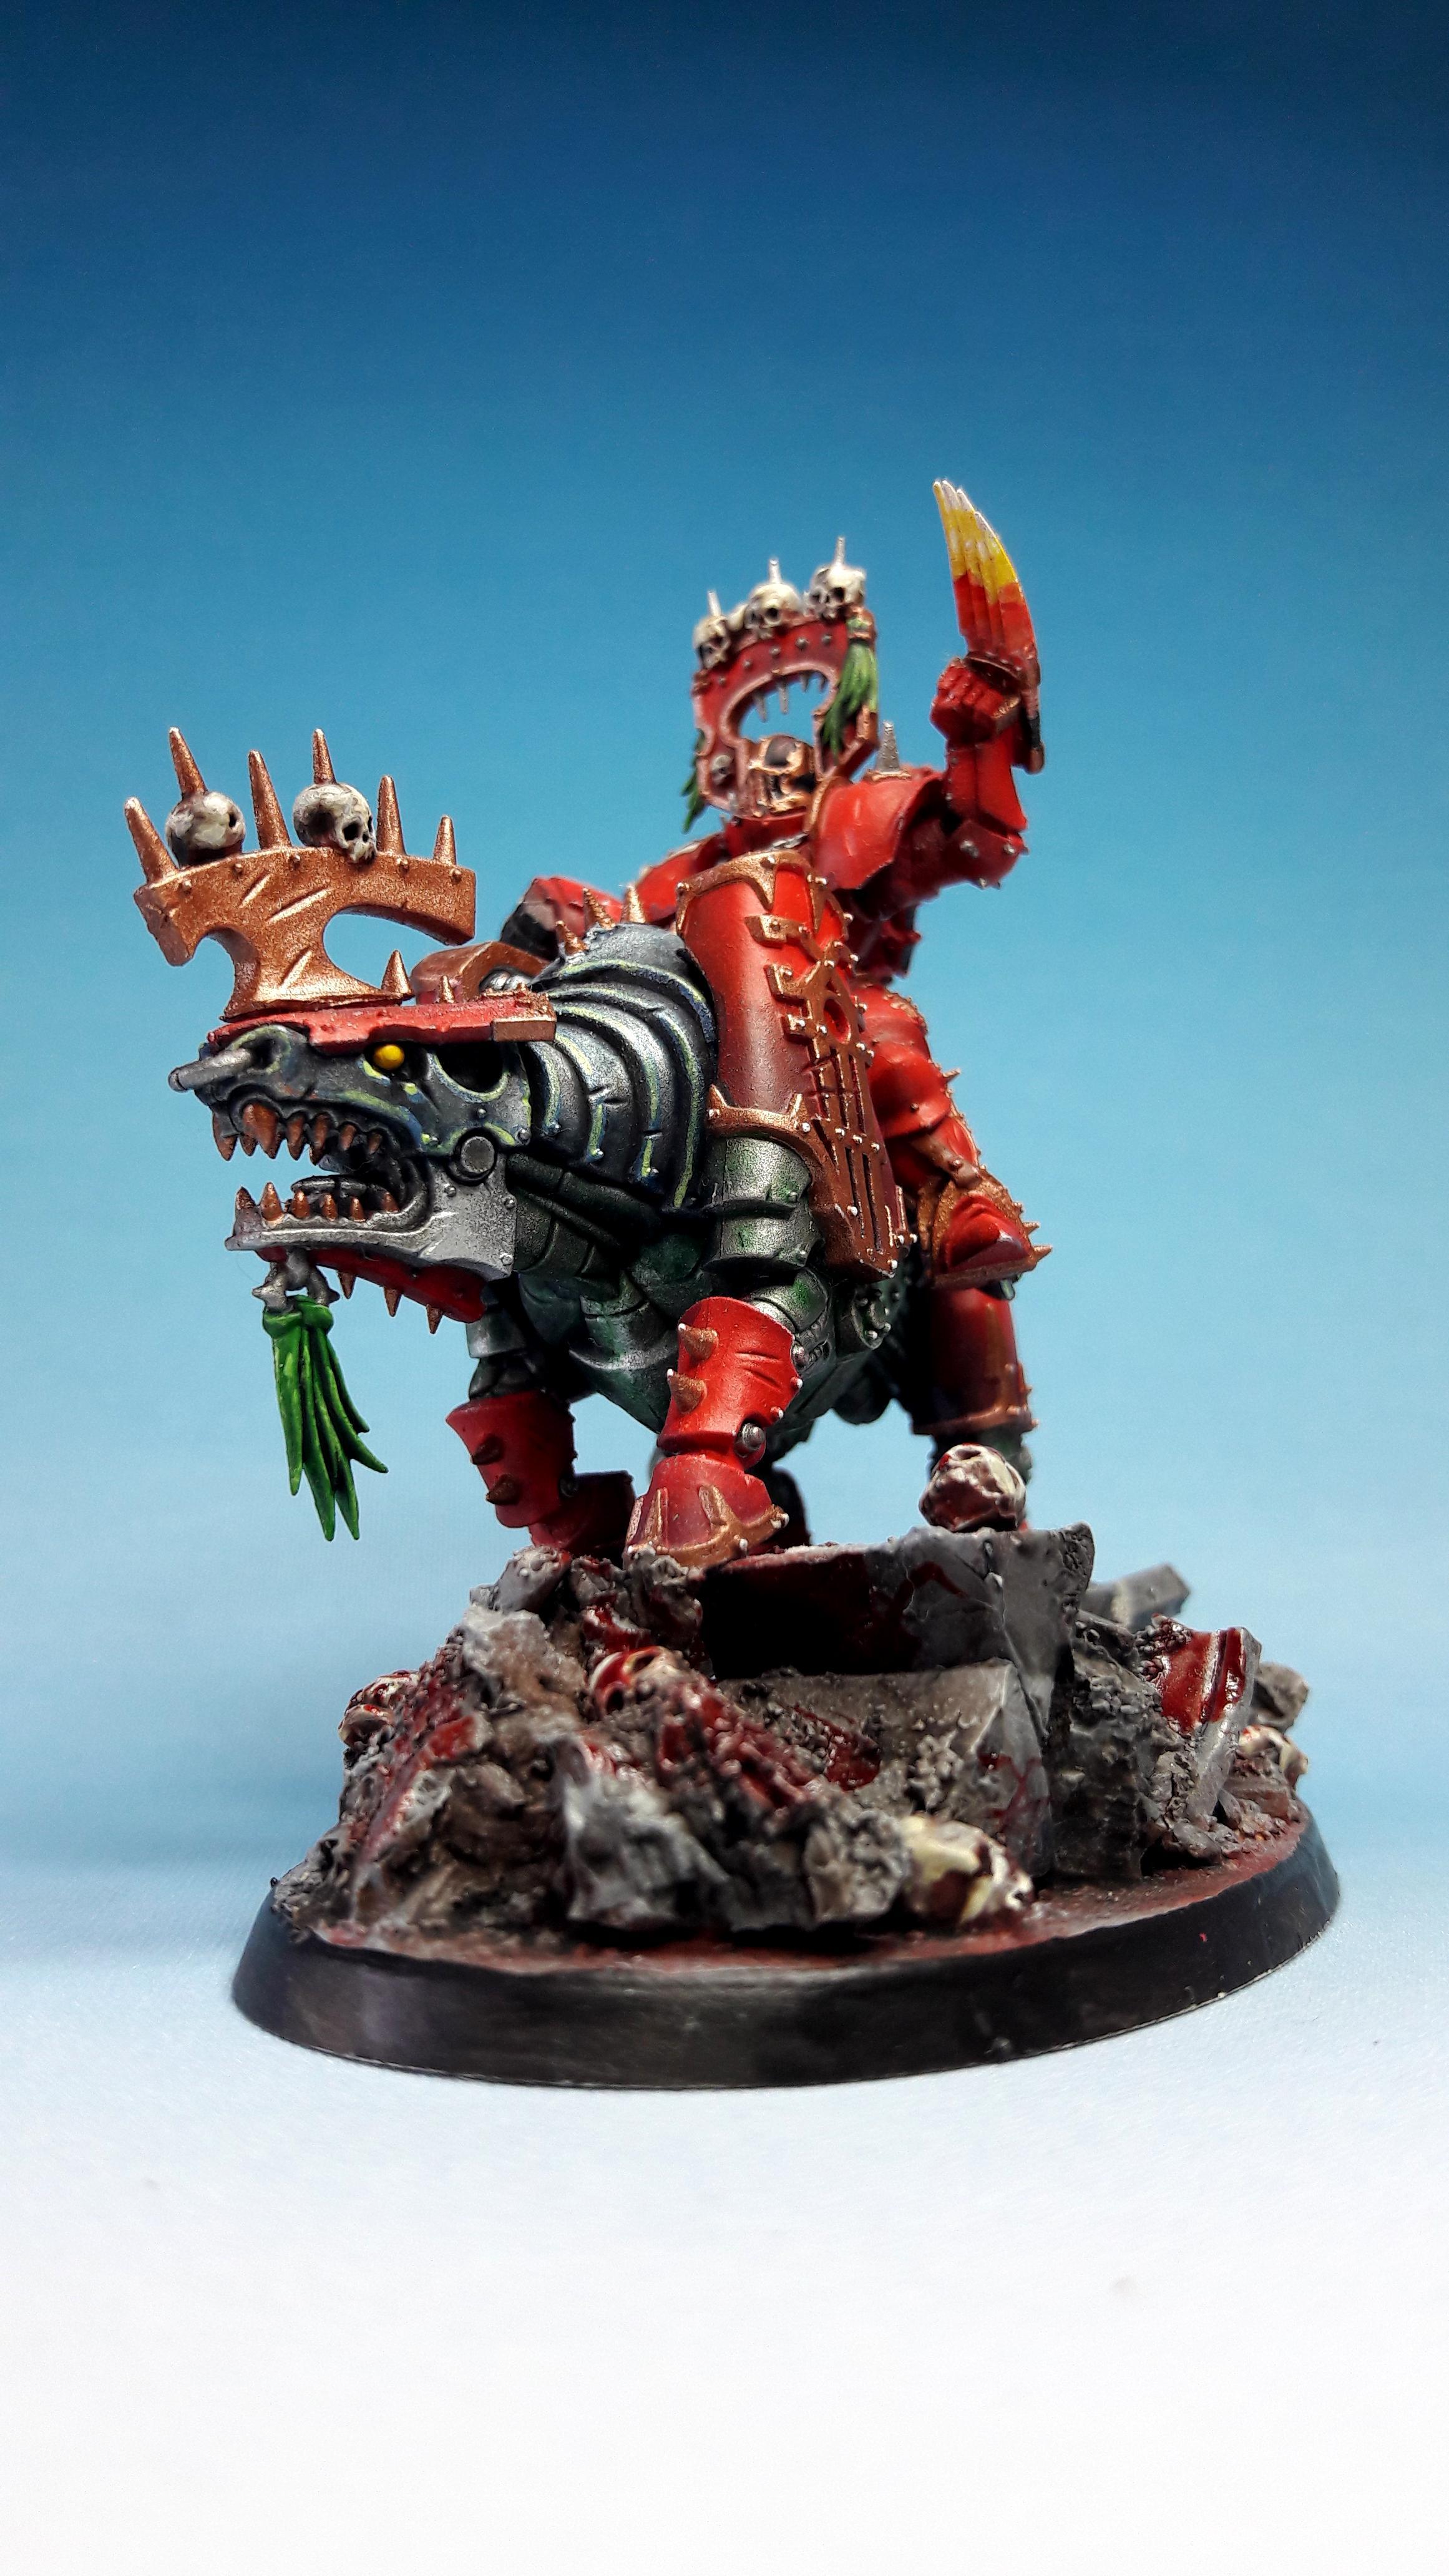 Chaos Lord, Juggerlord, Juggernaut, Juggernaut Lord